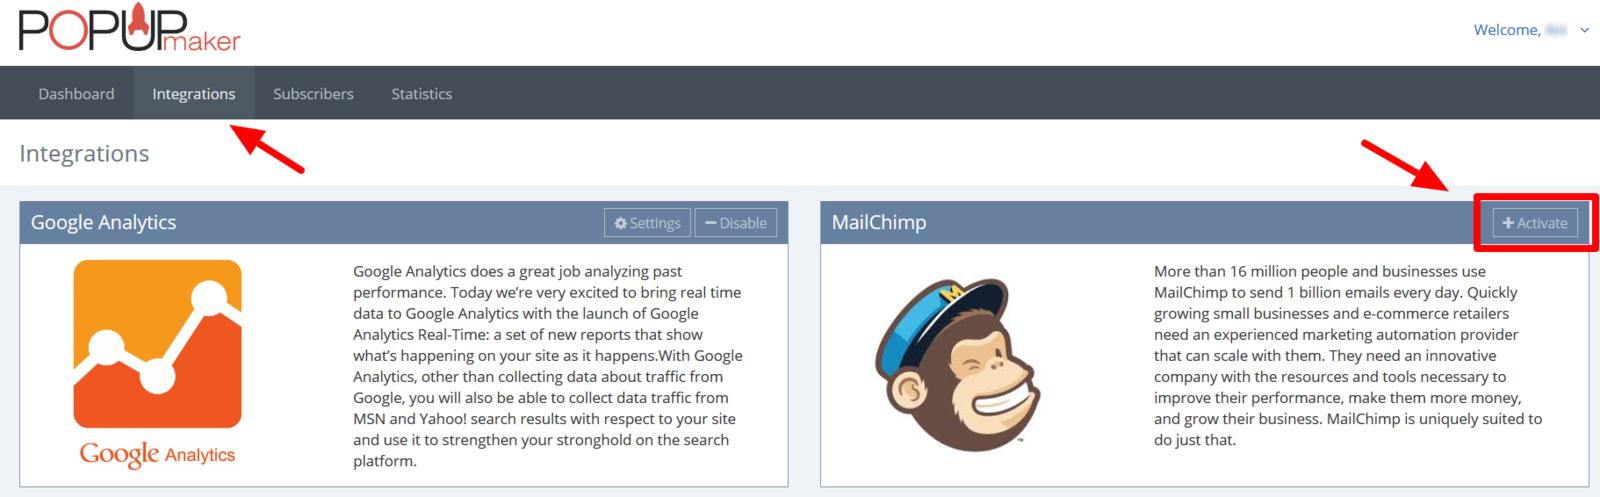 MailChimp Popup Creation